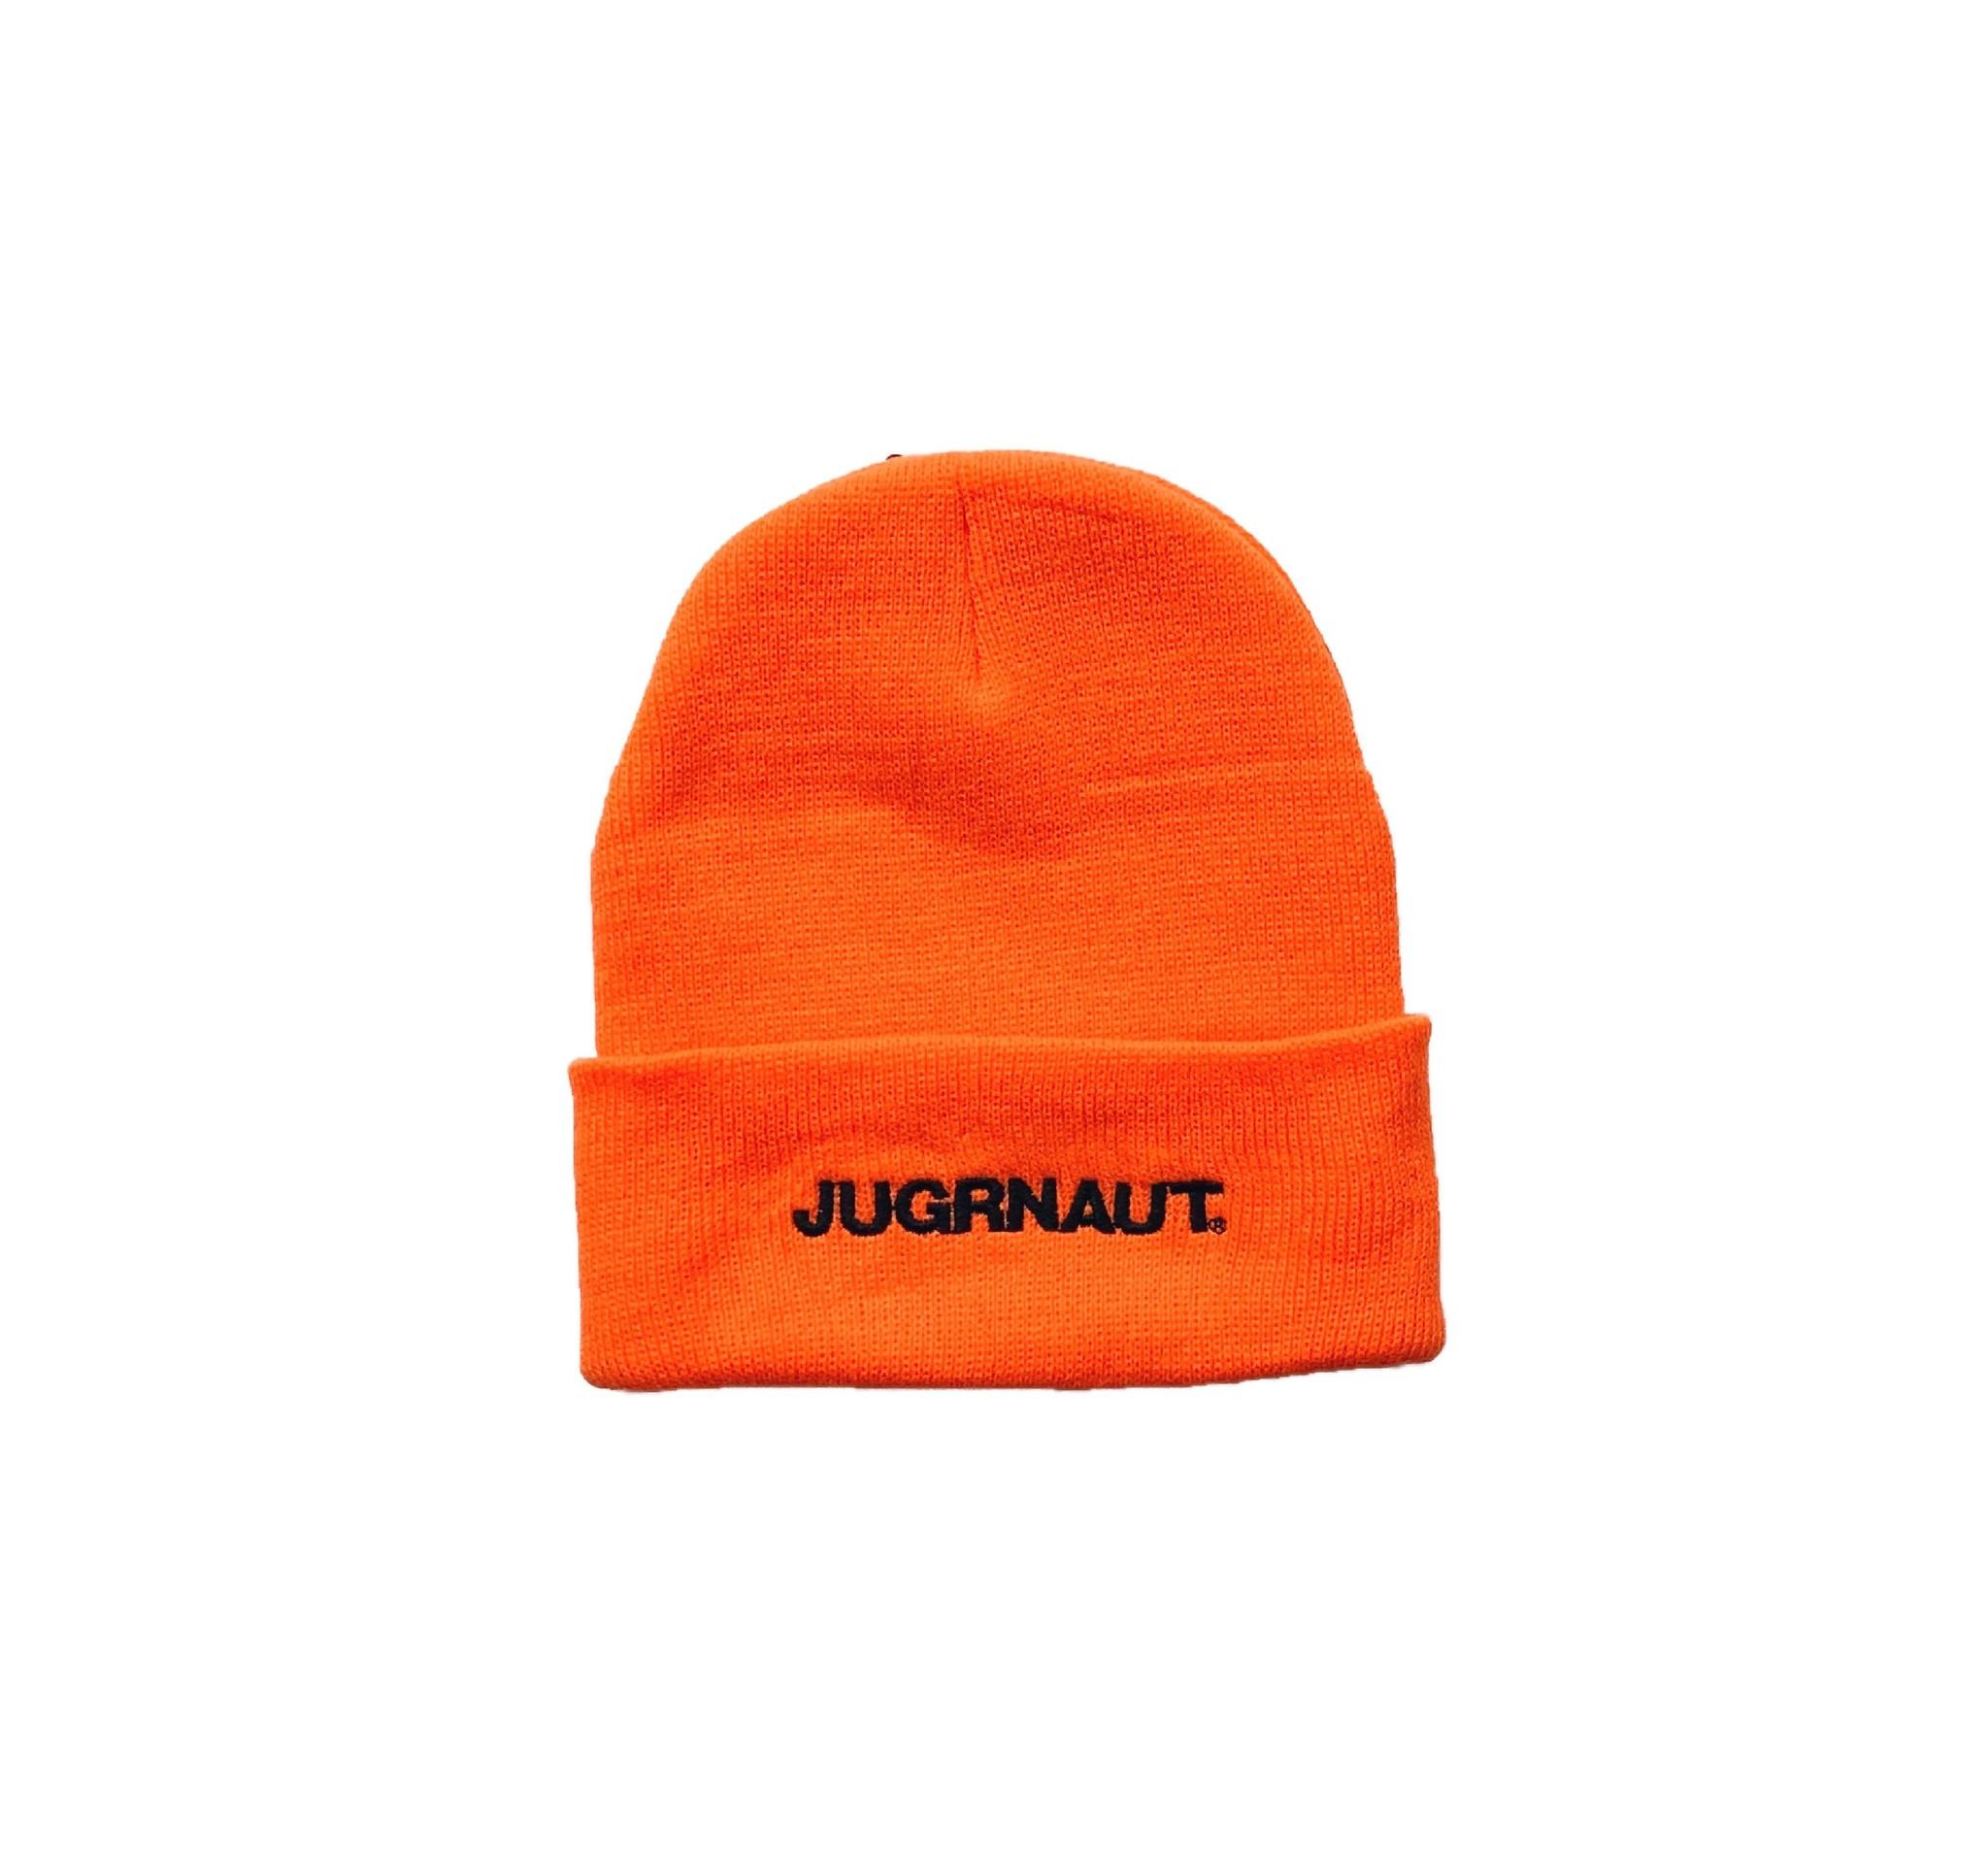 Jugrnaut Jugrnaut Thinsulate Text Logo Orange